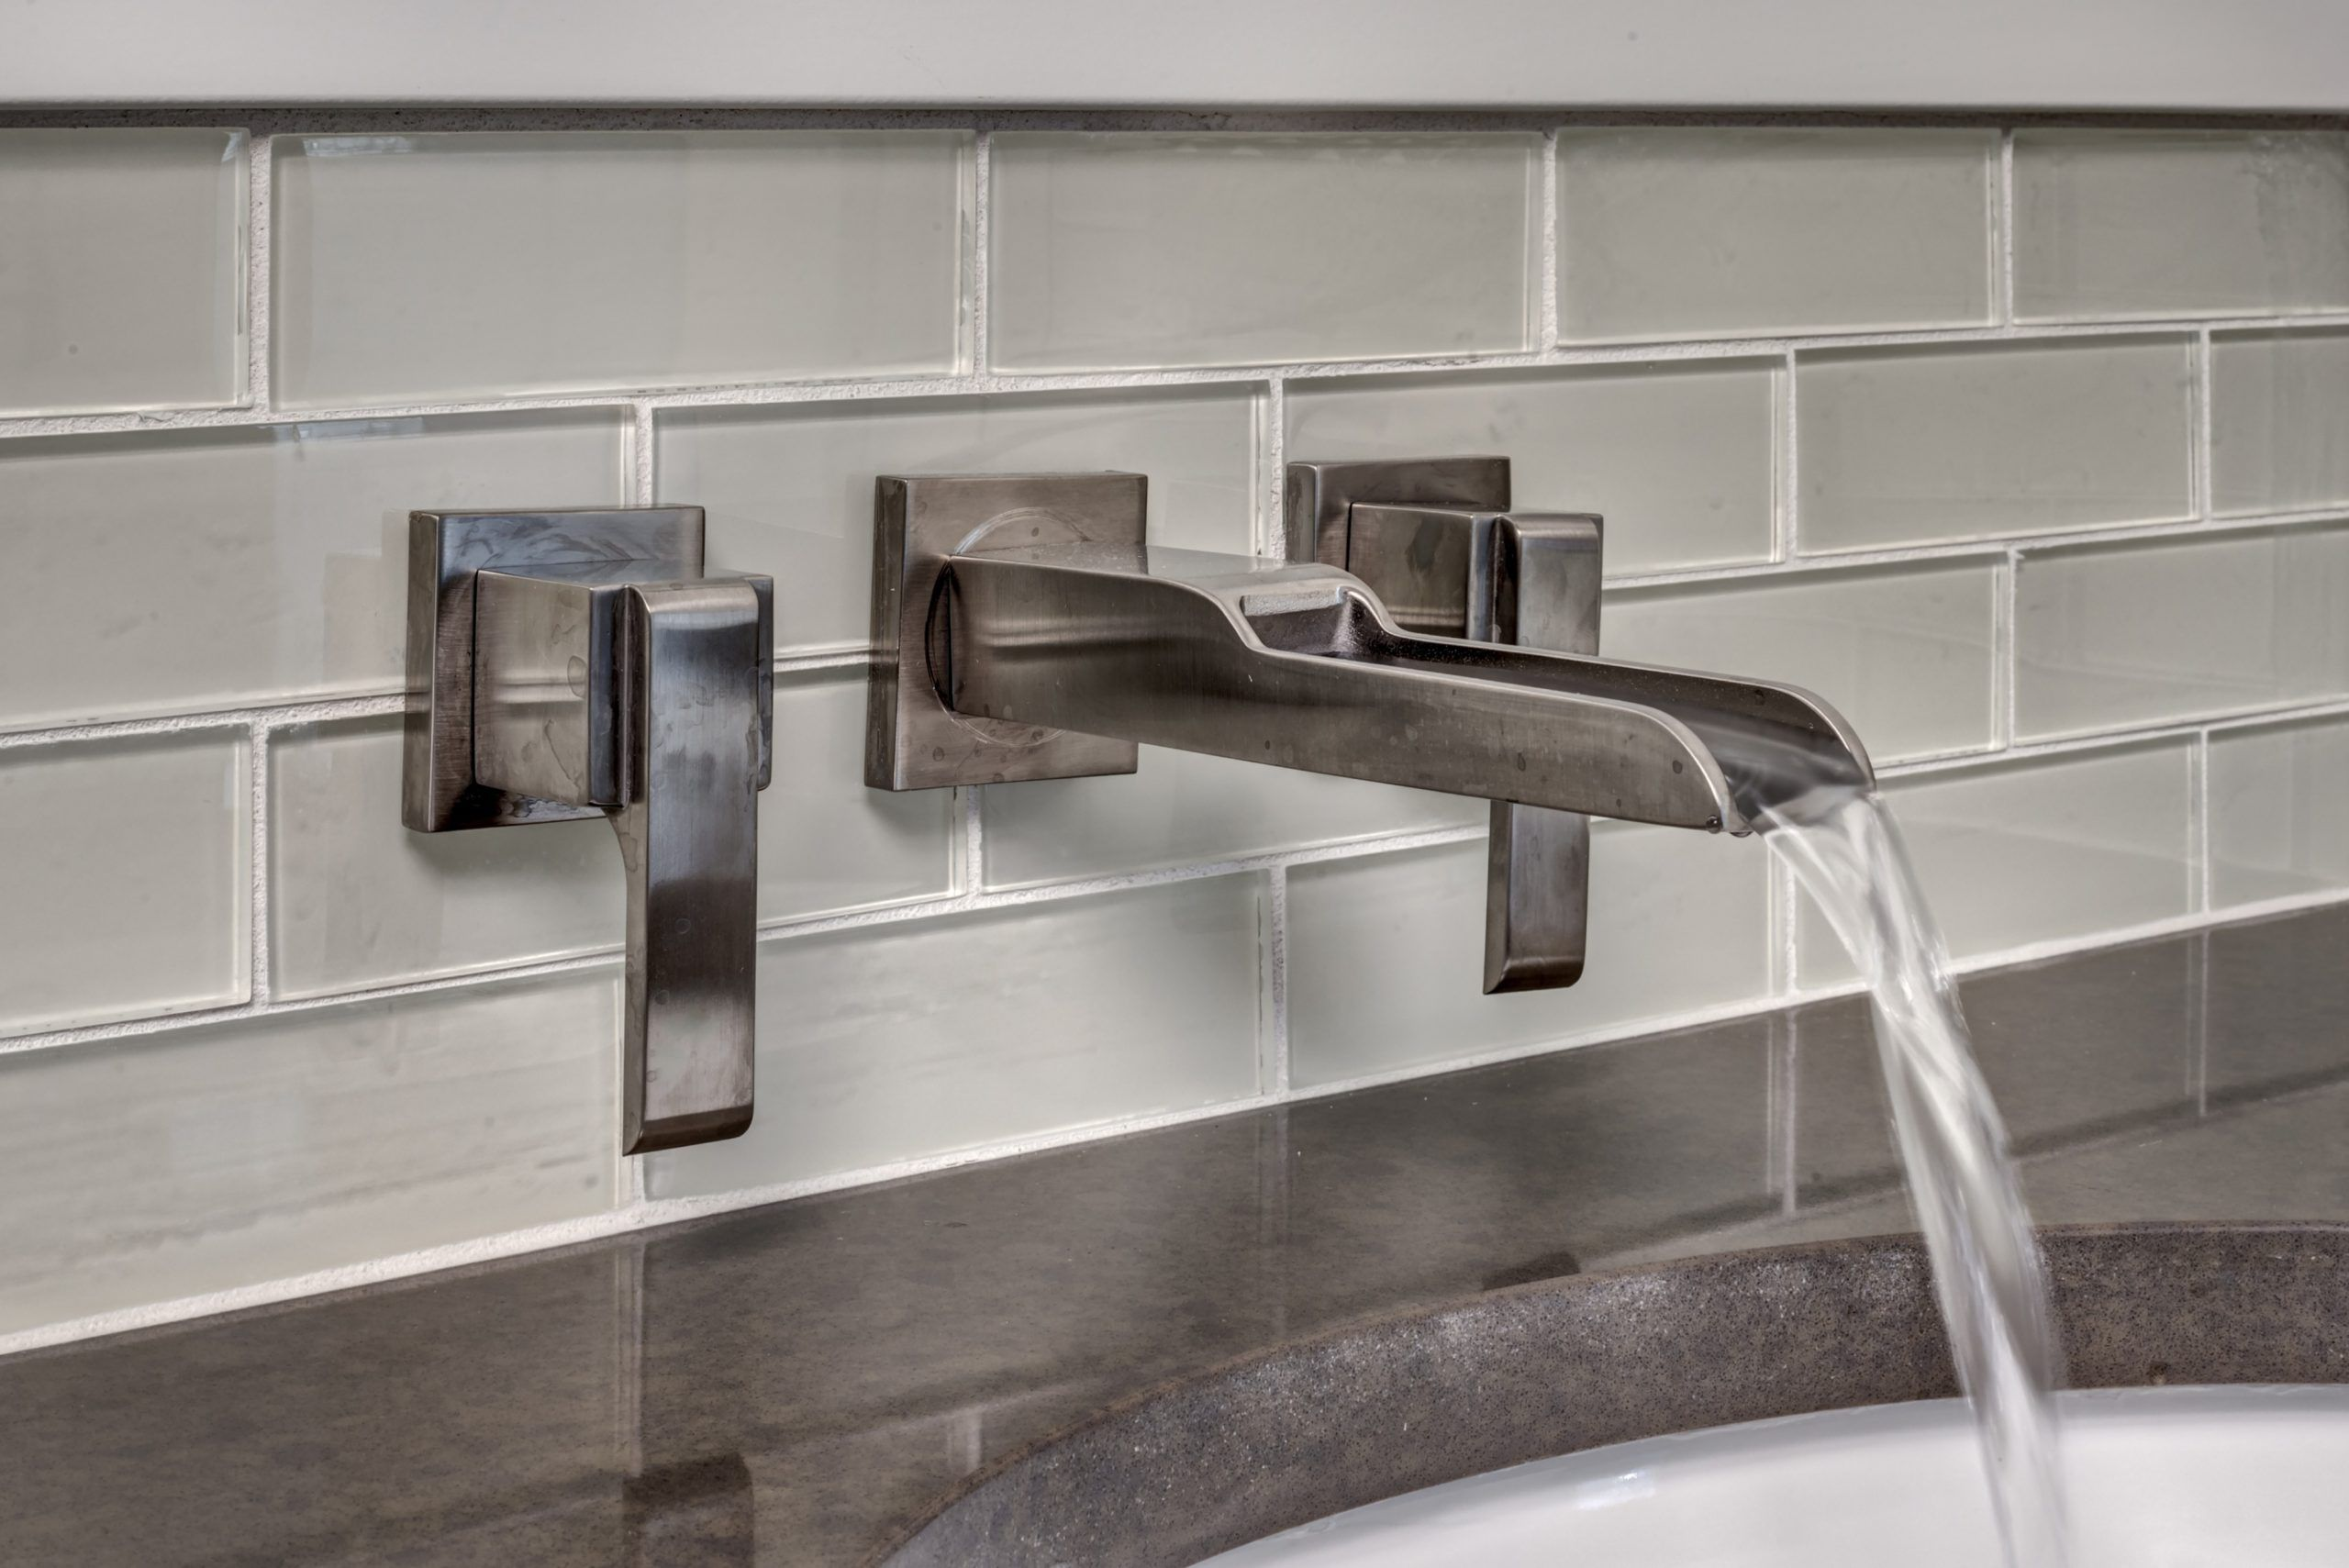 Pin On Bathroom Faucets New bathroom backsplash ideas home